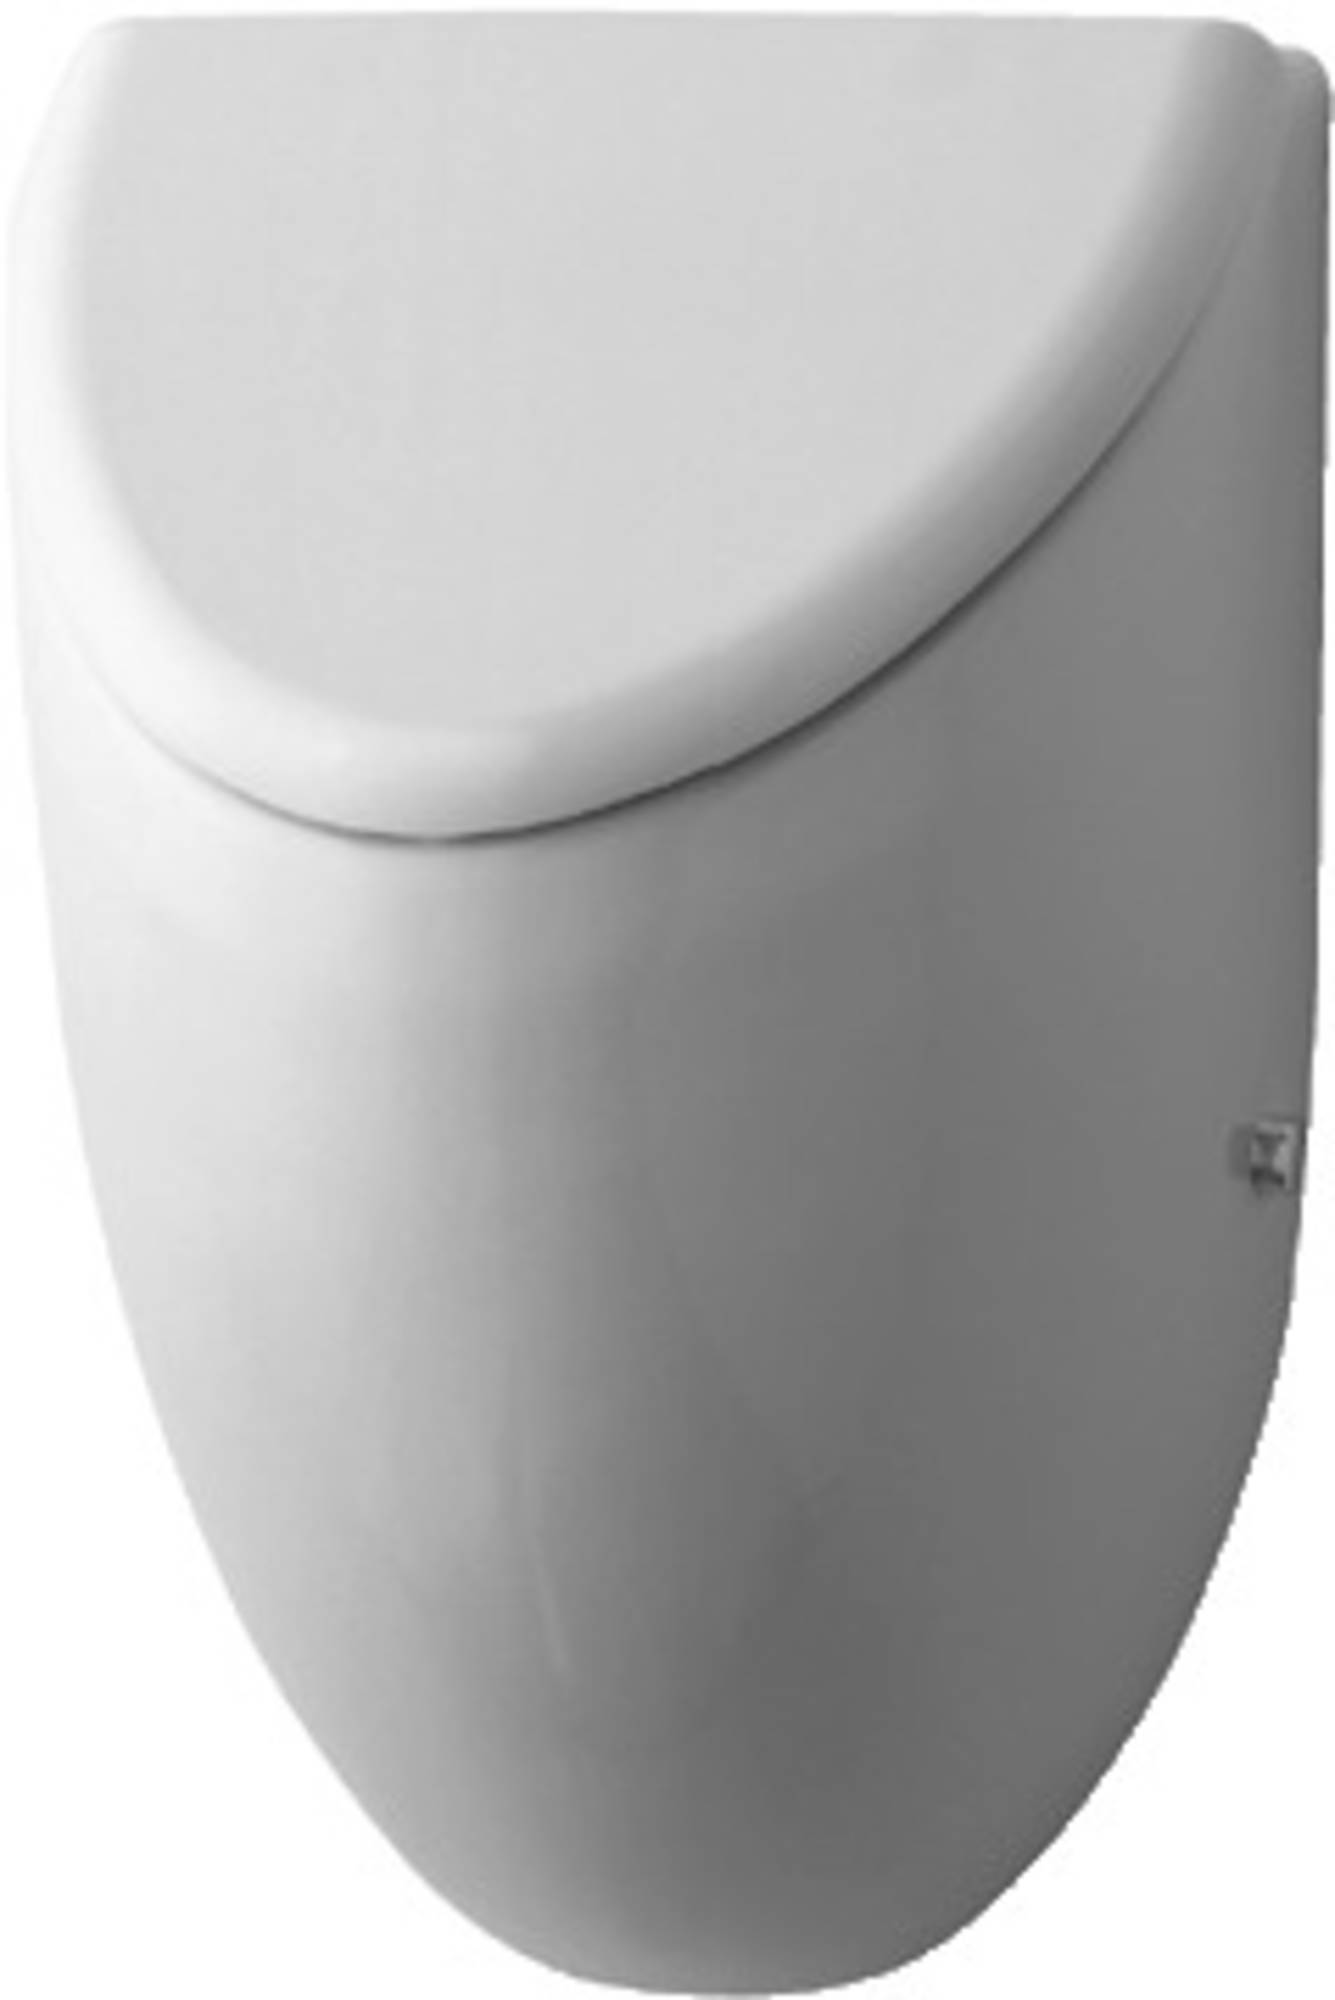 Duravit Fizz urinoir voor deksel WonderGliss wit